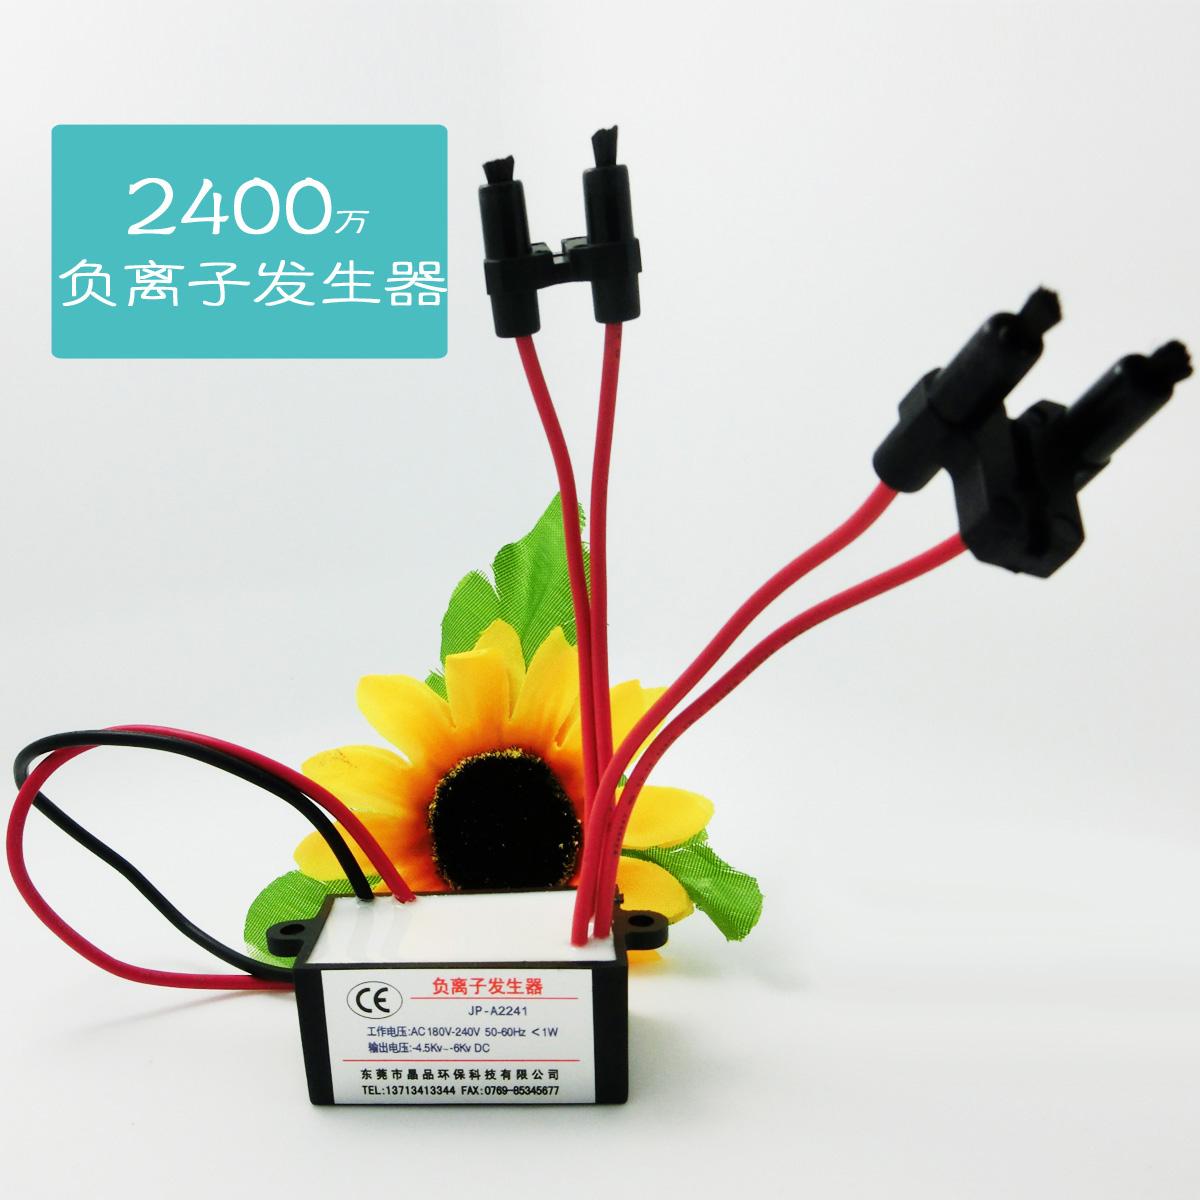 Воздухоочиститель 220 воздухоувлажнитель воздухоочиститель lg hw306lge0 aeru